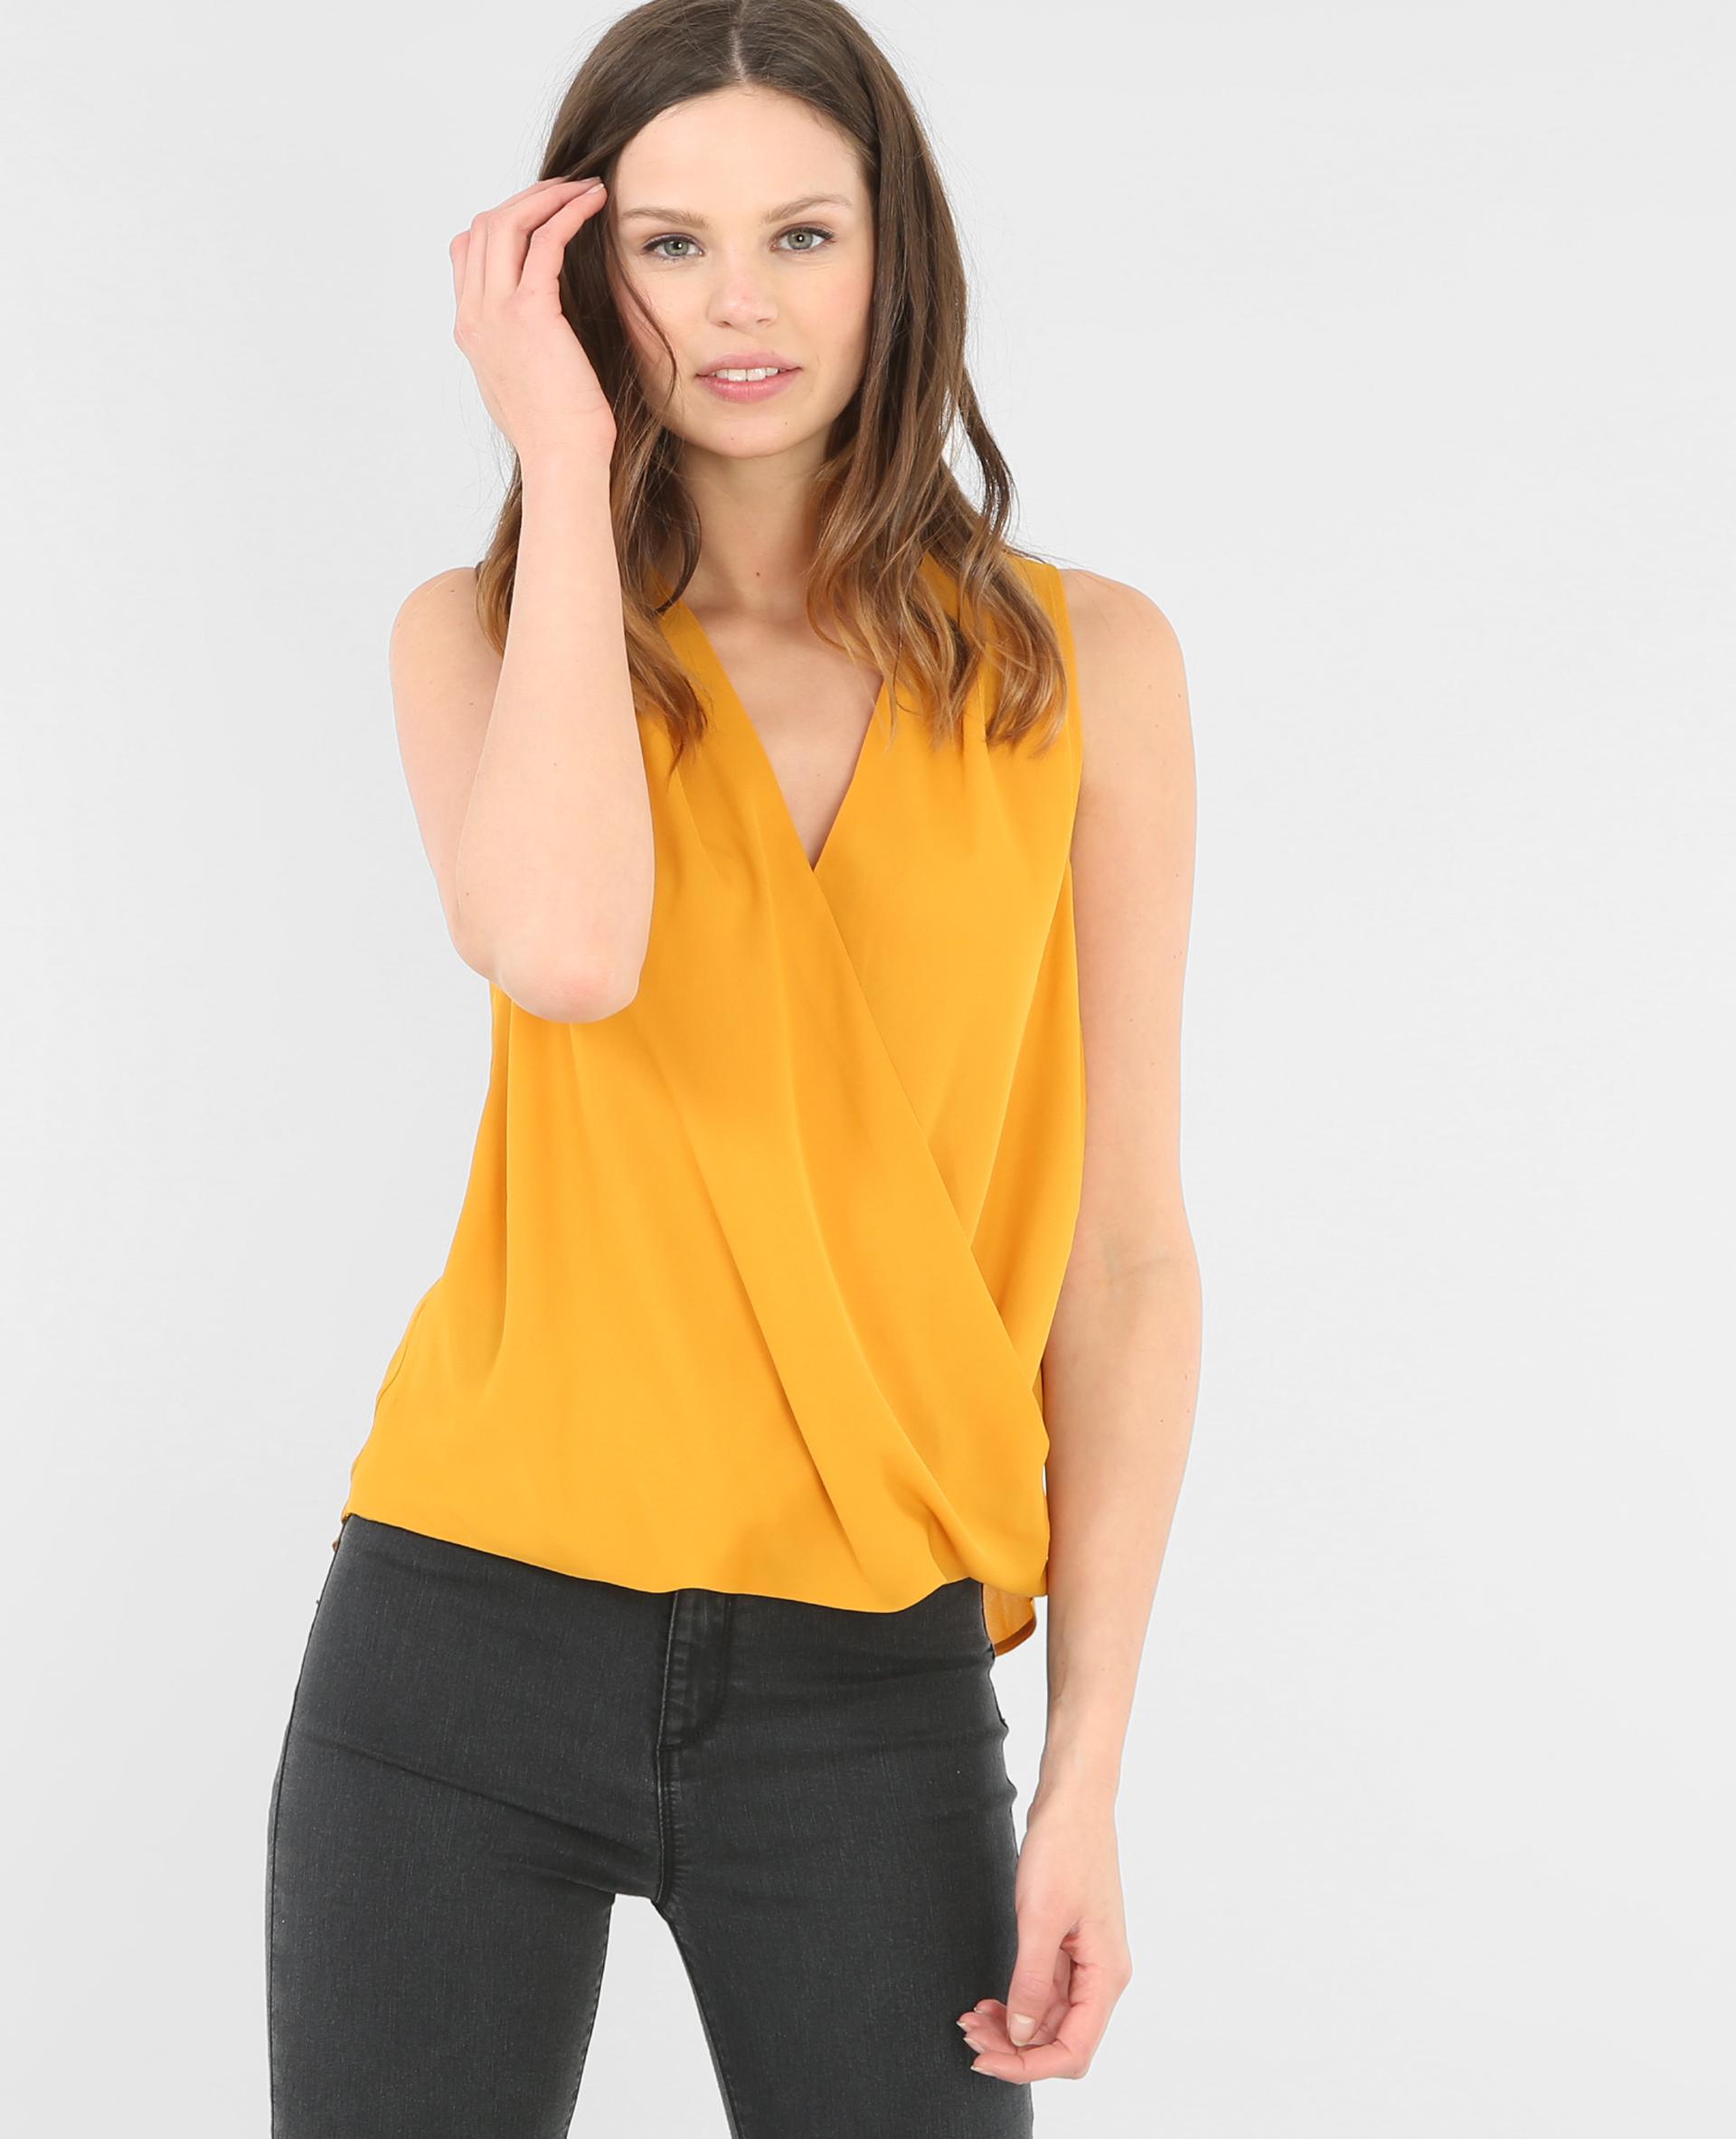 blouse cache coeur jaune 567103003a00 pimkie. Black Bedroom Furniture Sets. Home Design Ideas